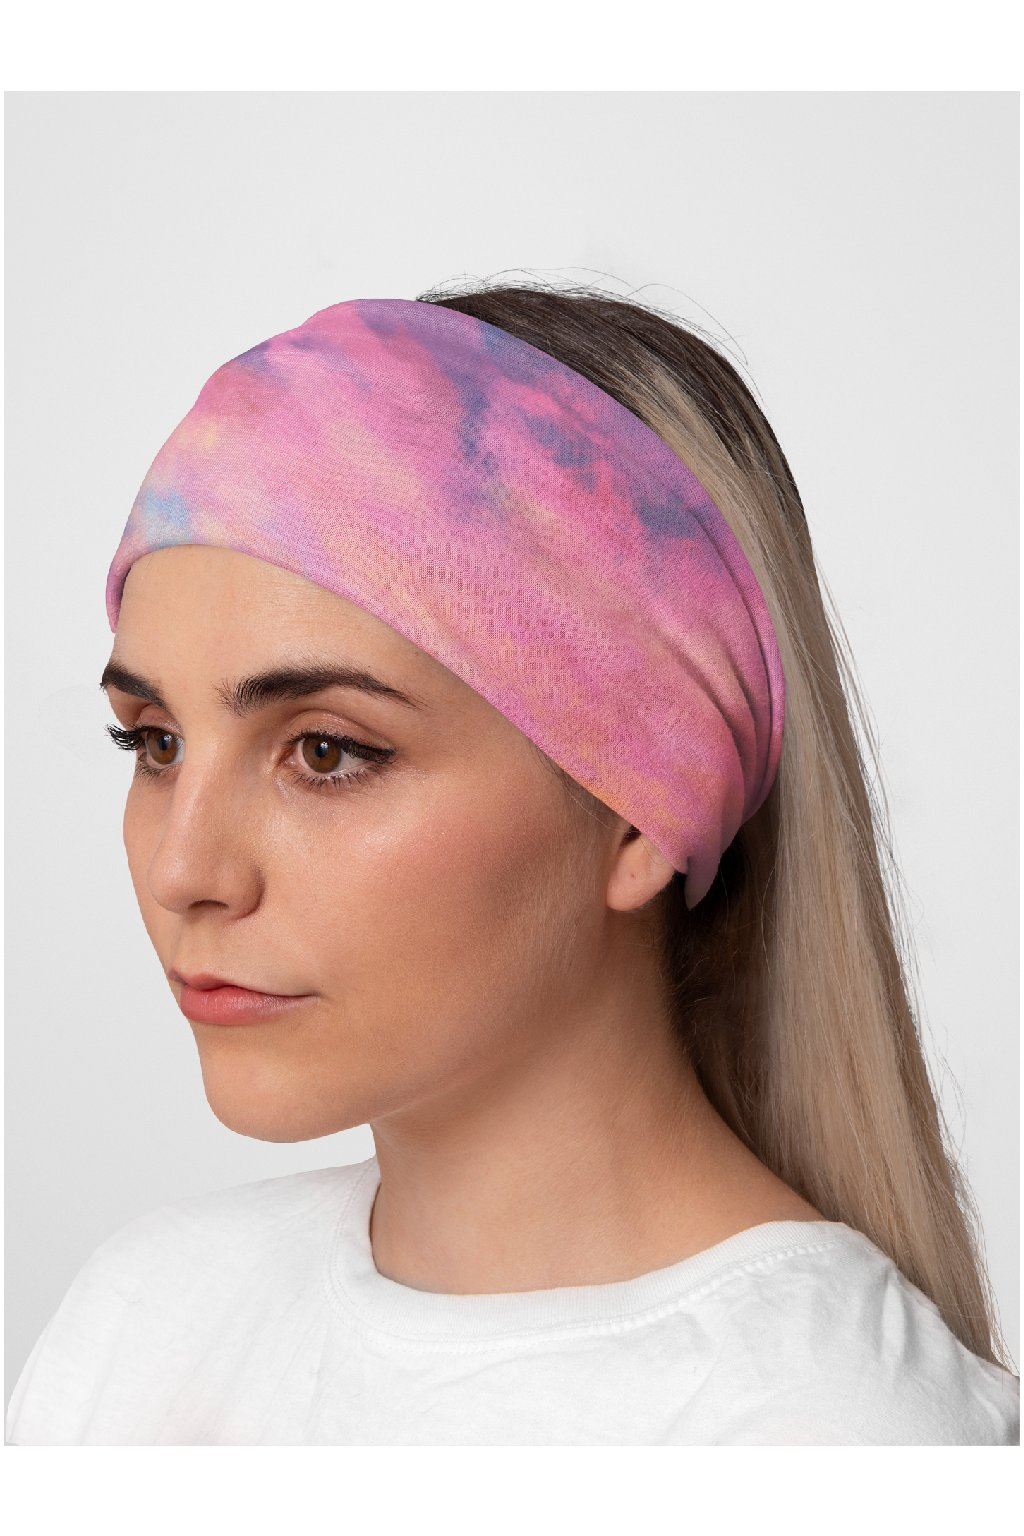 mockup of a woman at a studio wearing a tubular bandana on her head 36077 (1)